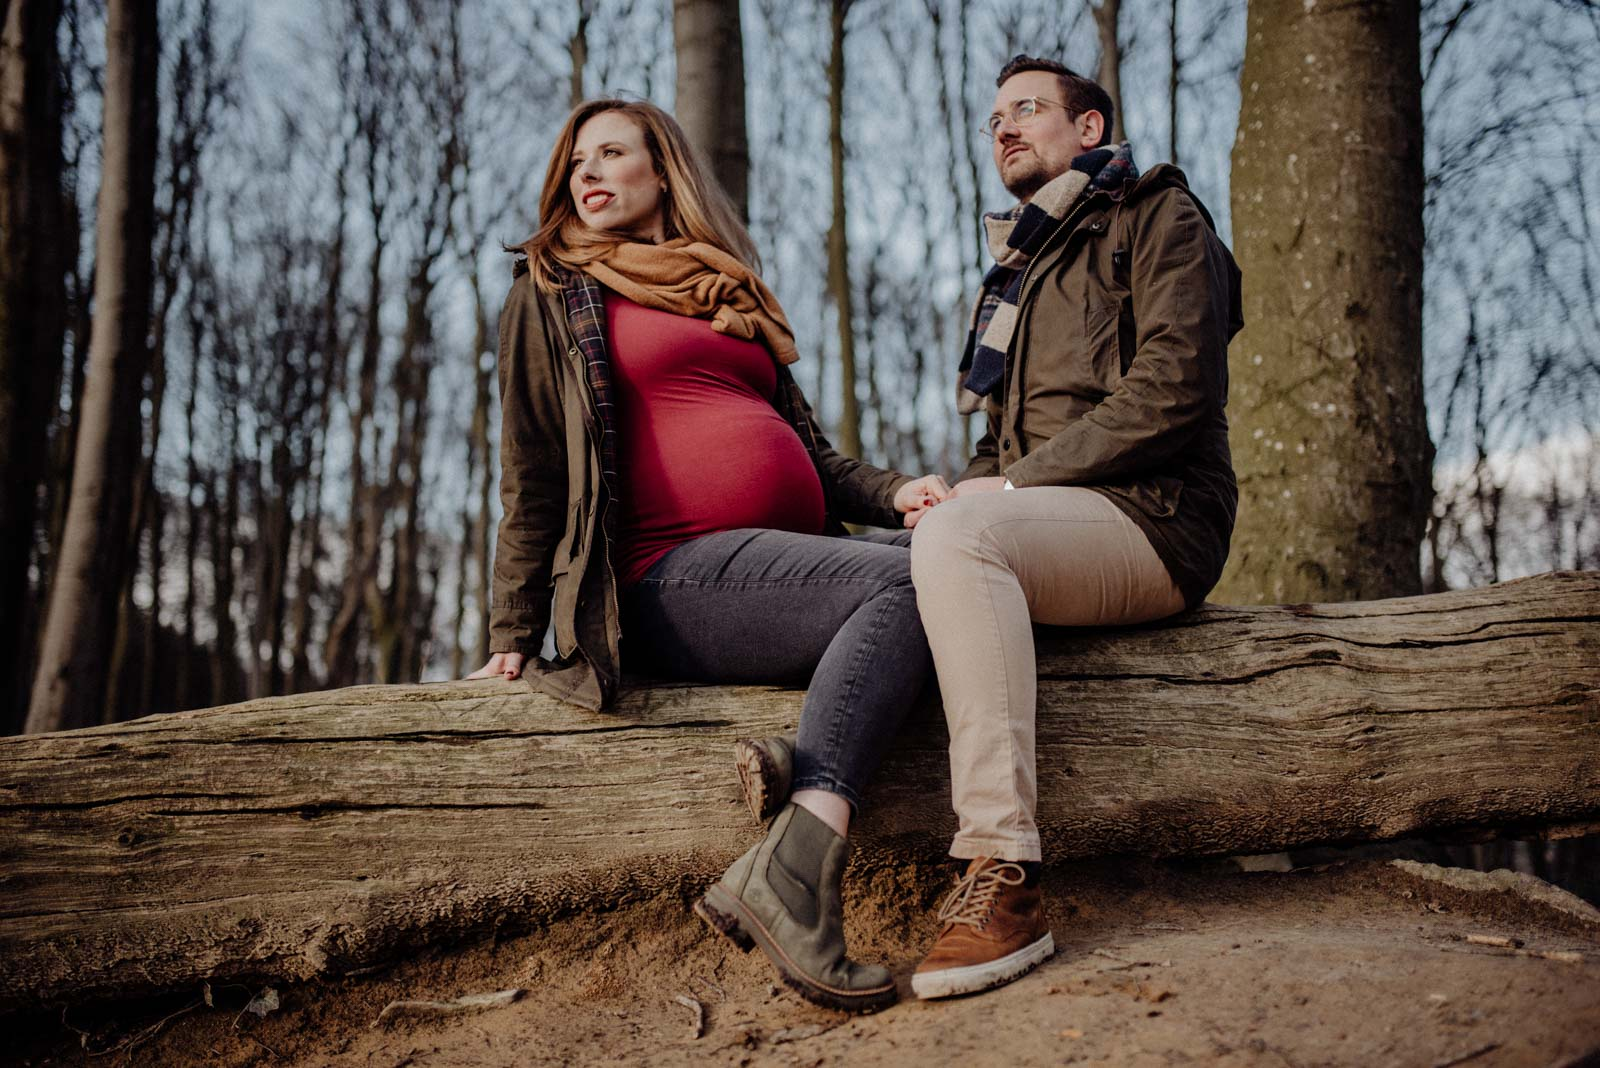 008-Babybauch-Shooting-Wald-Natur-Witten-Familienfotografie-Familienfotos